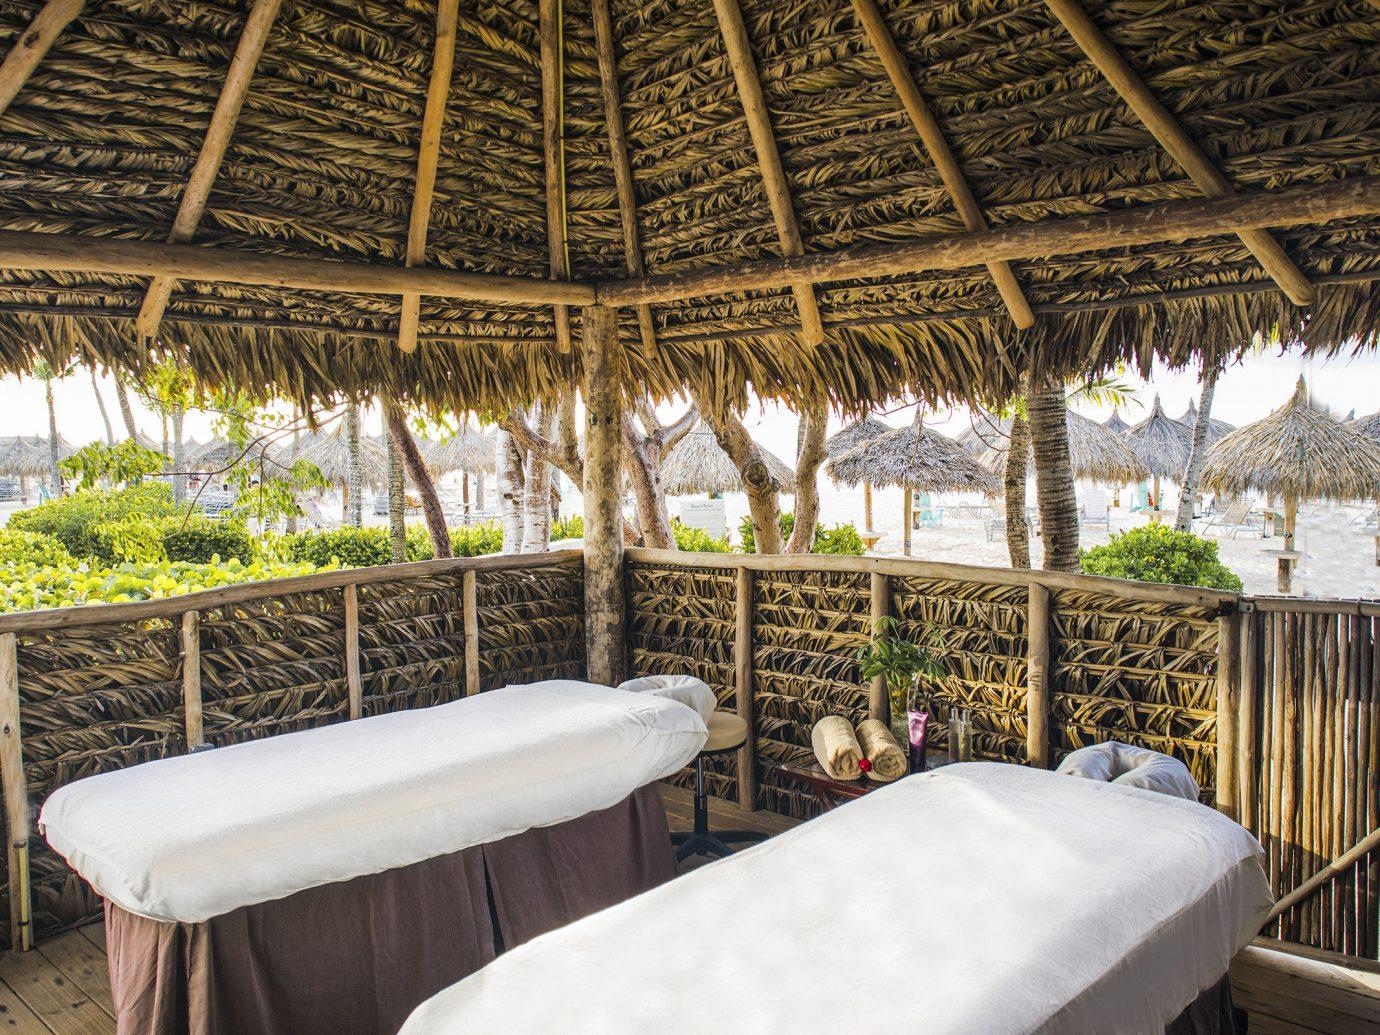 Trip Ideas Resort room bed estate restaurant Villa eco hotel cottage palace Bedroom area furniture